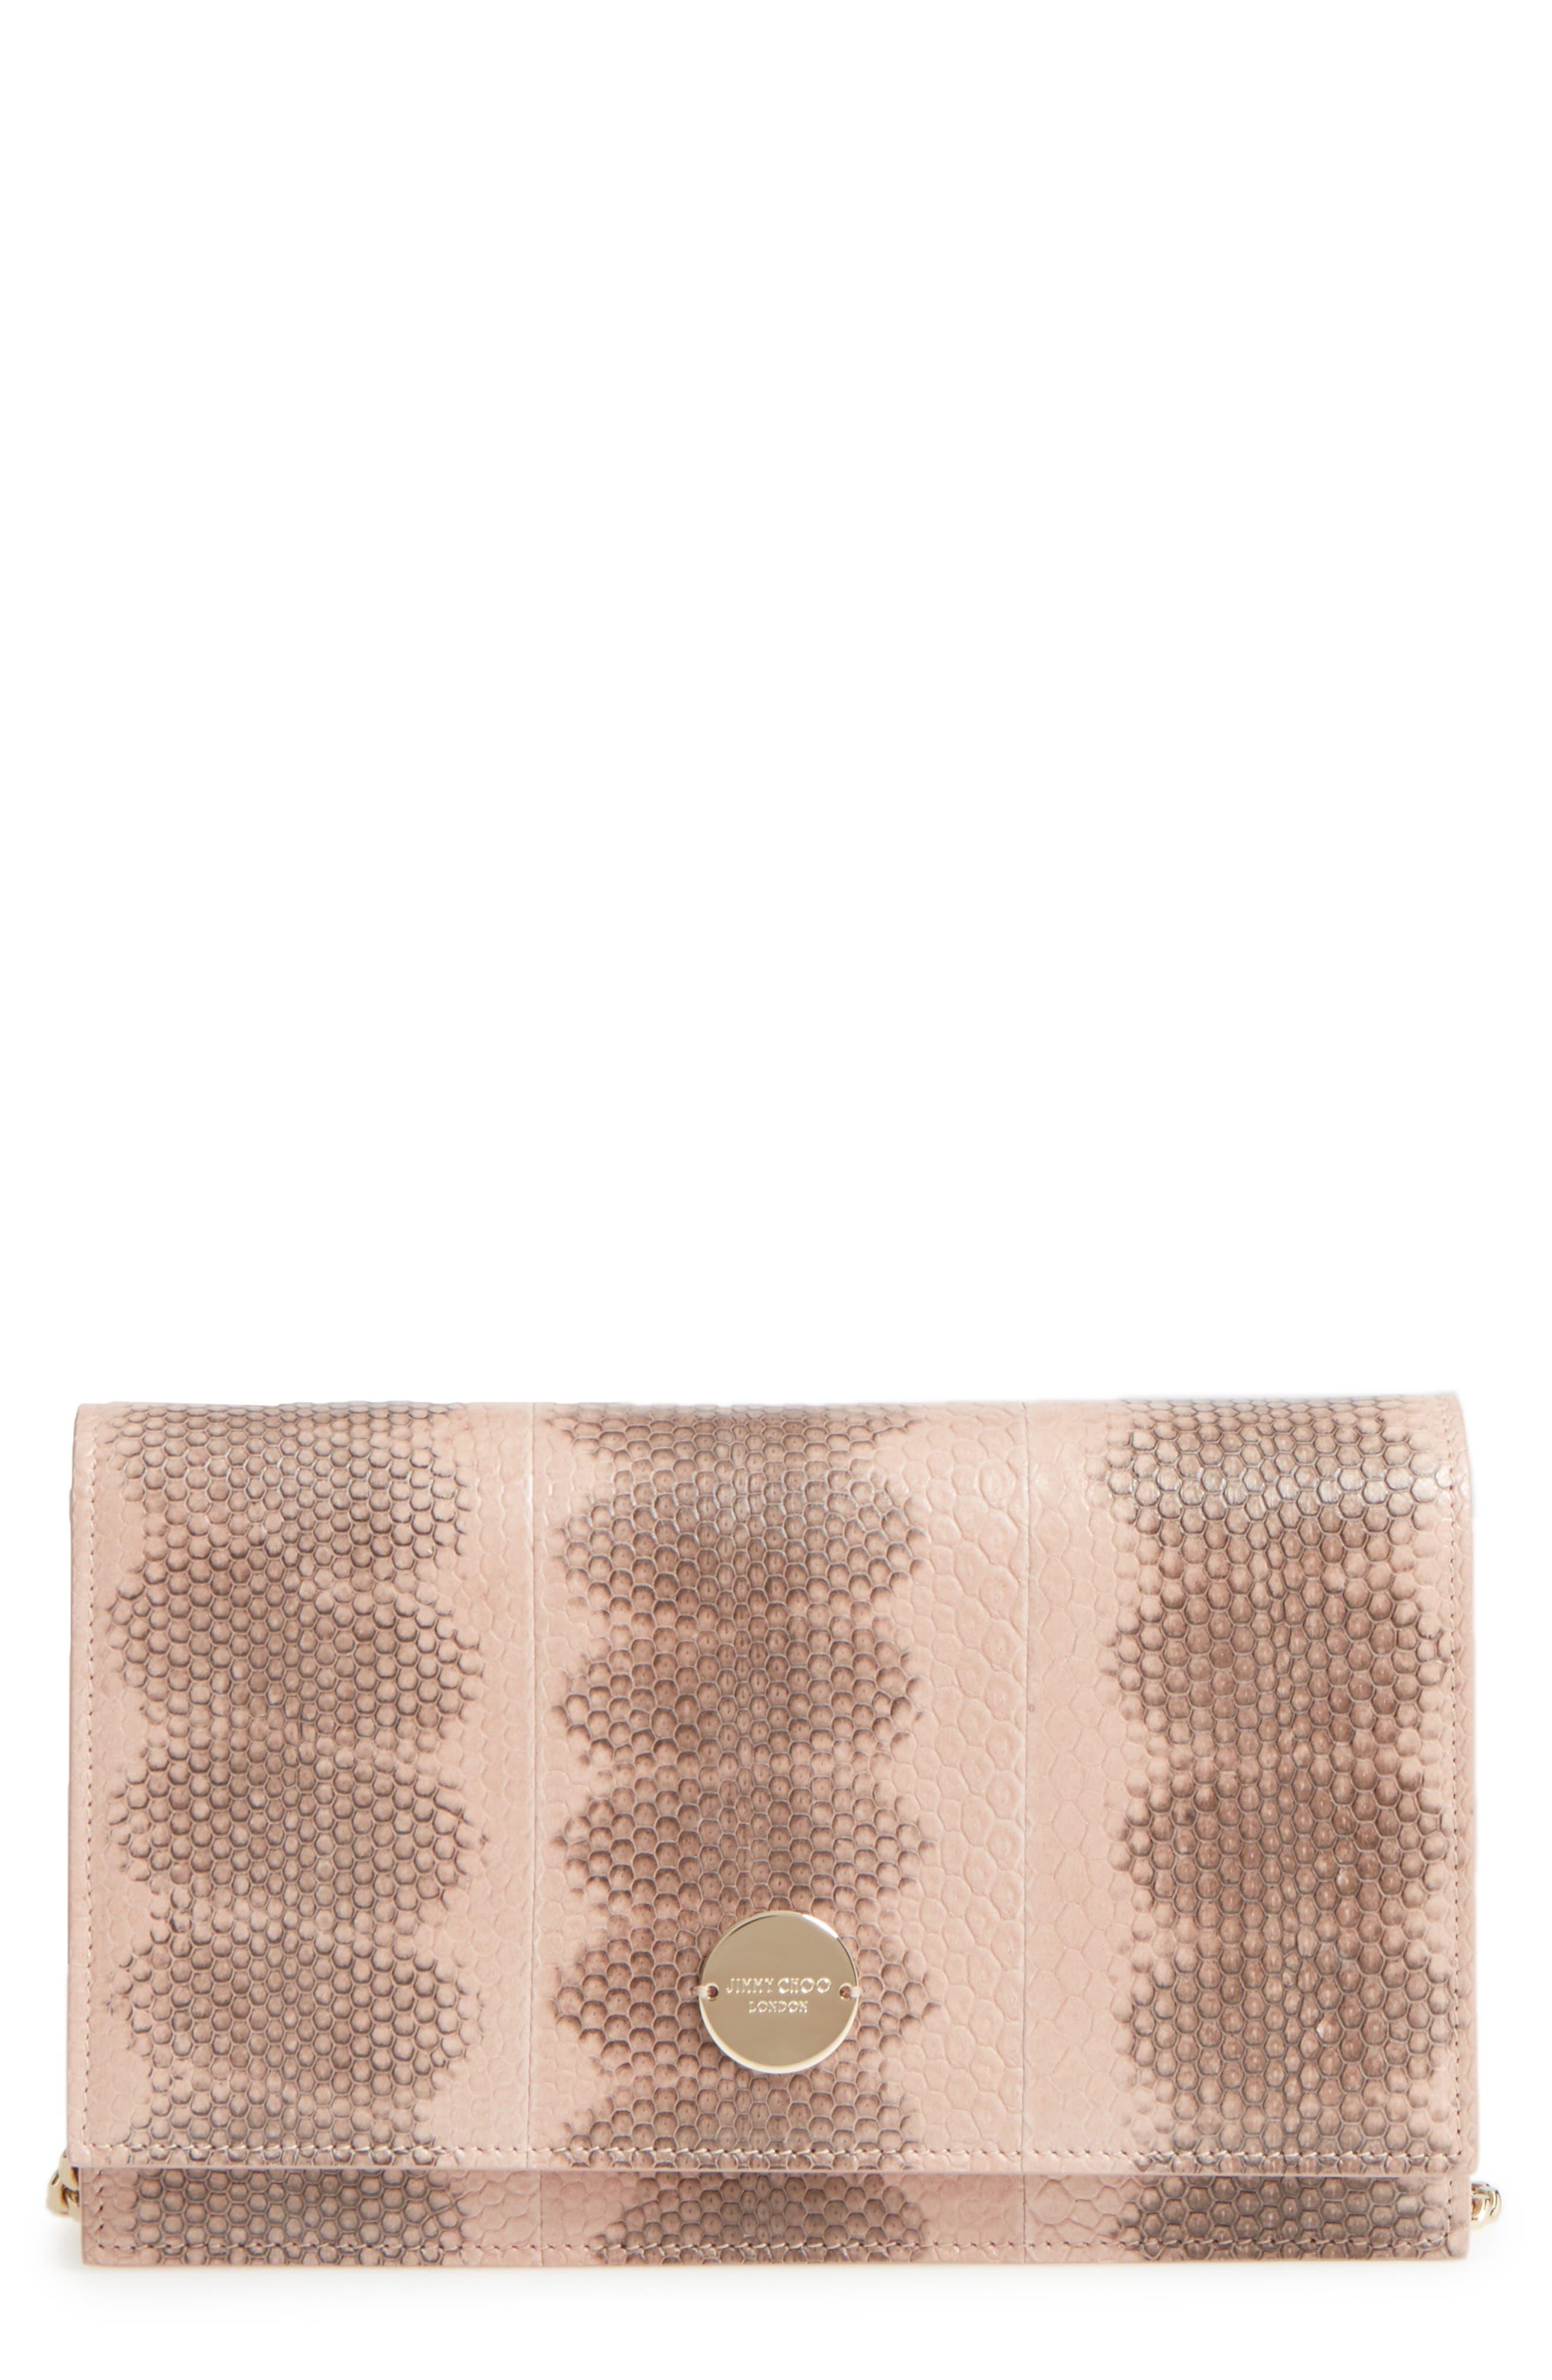 Main Image - Jimmy Choo Florence Genuine Snakeskin Crossbody Bag